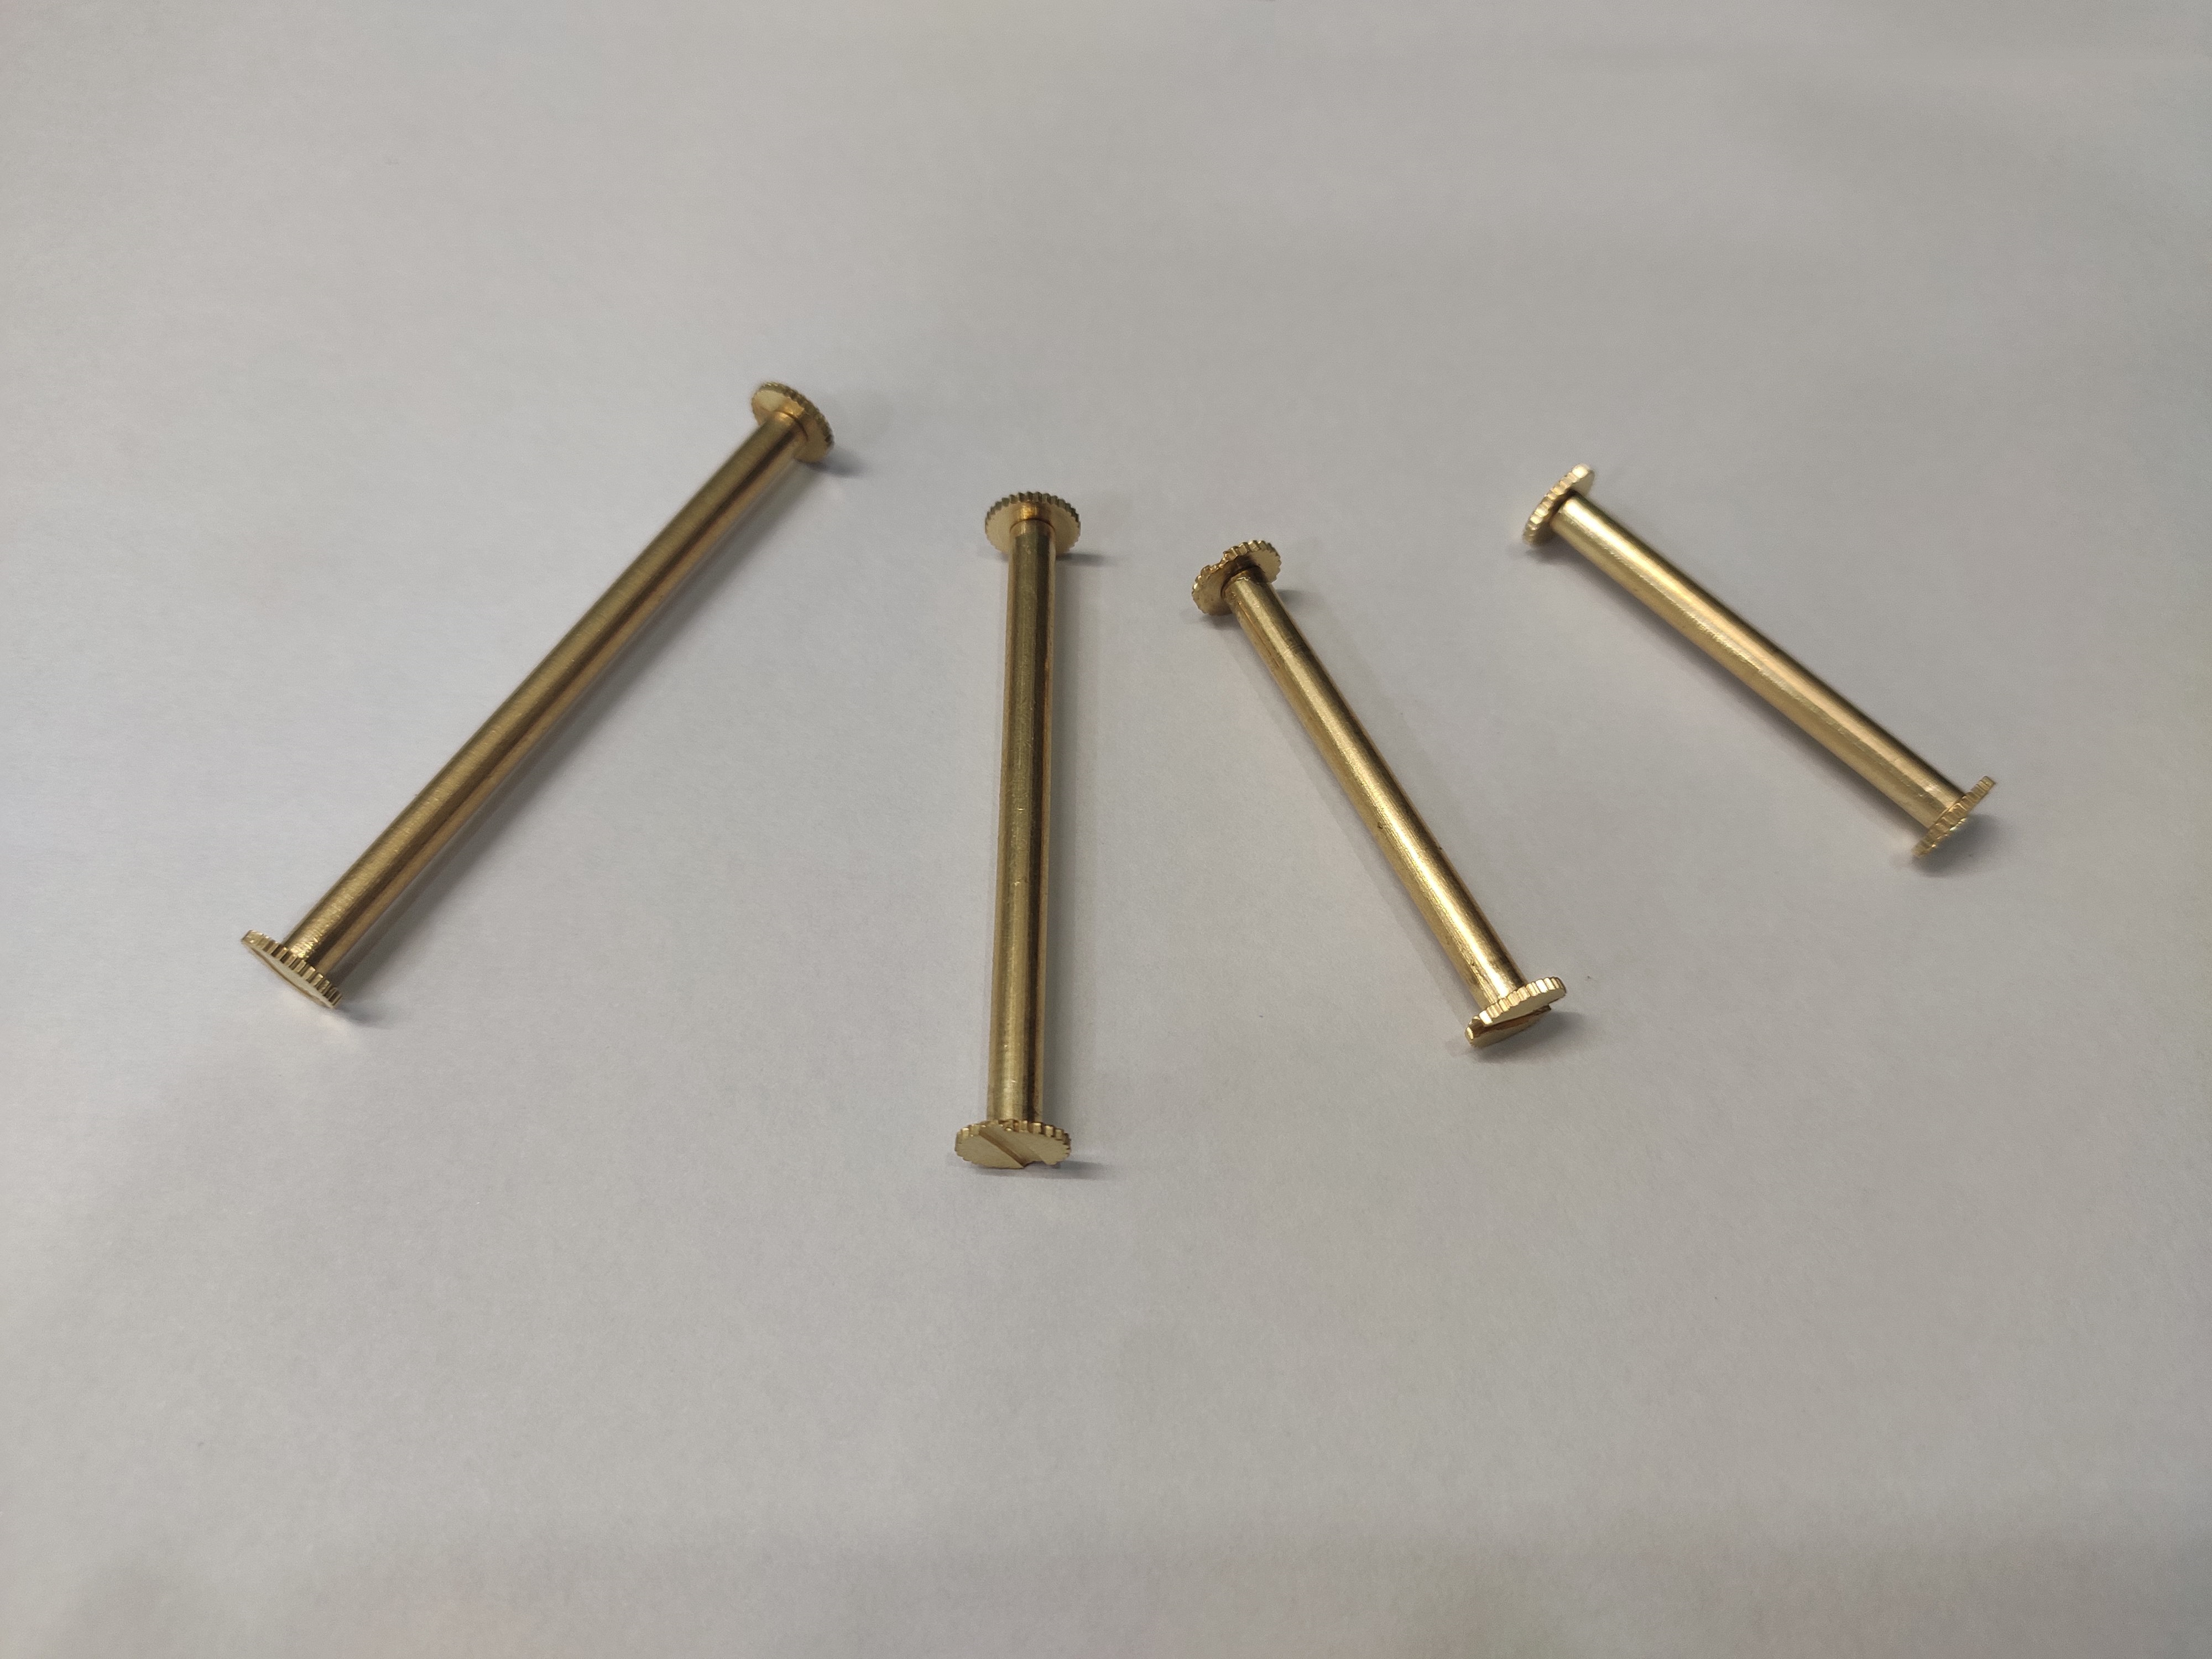 Brass File Screw